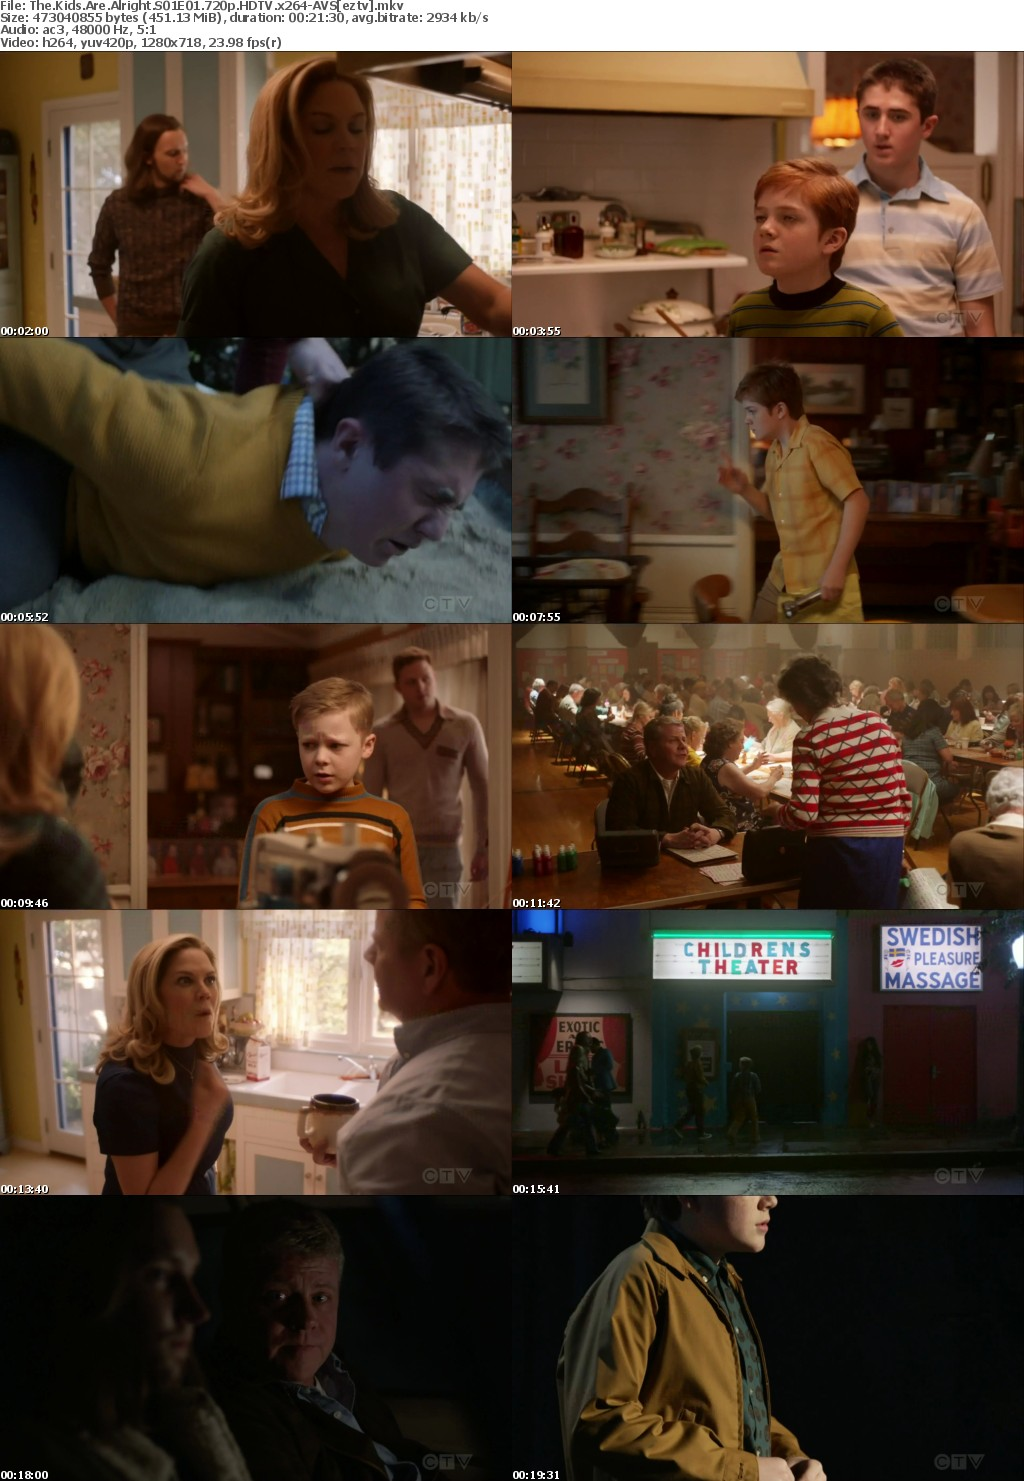 The Kids Are Alright S01E01 720p HDTV x264-AVS